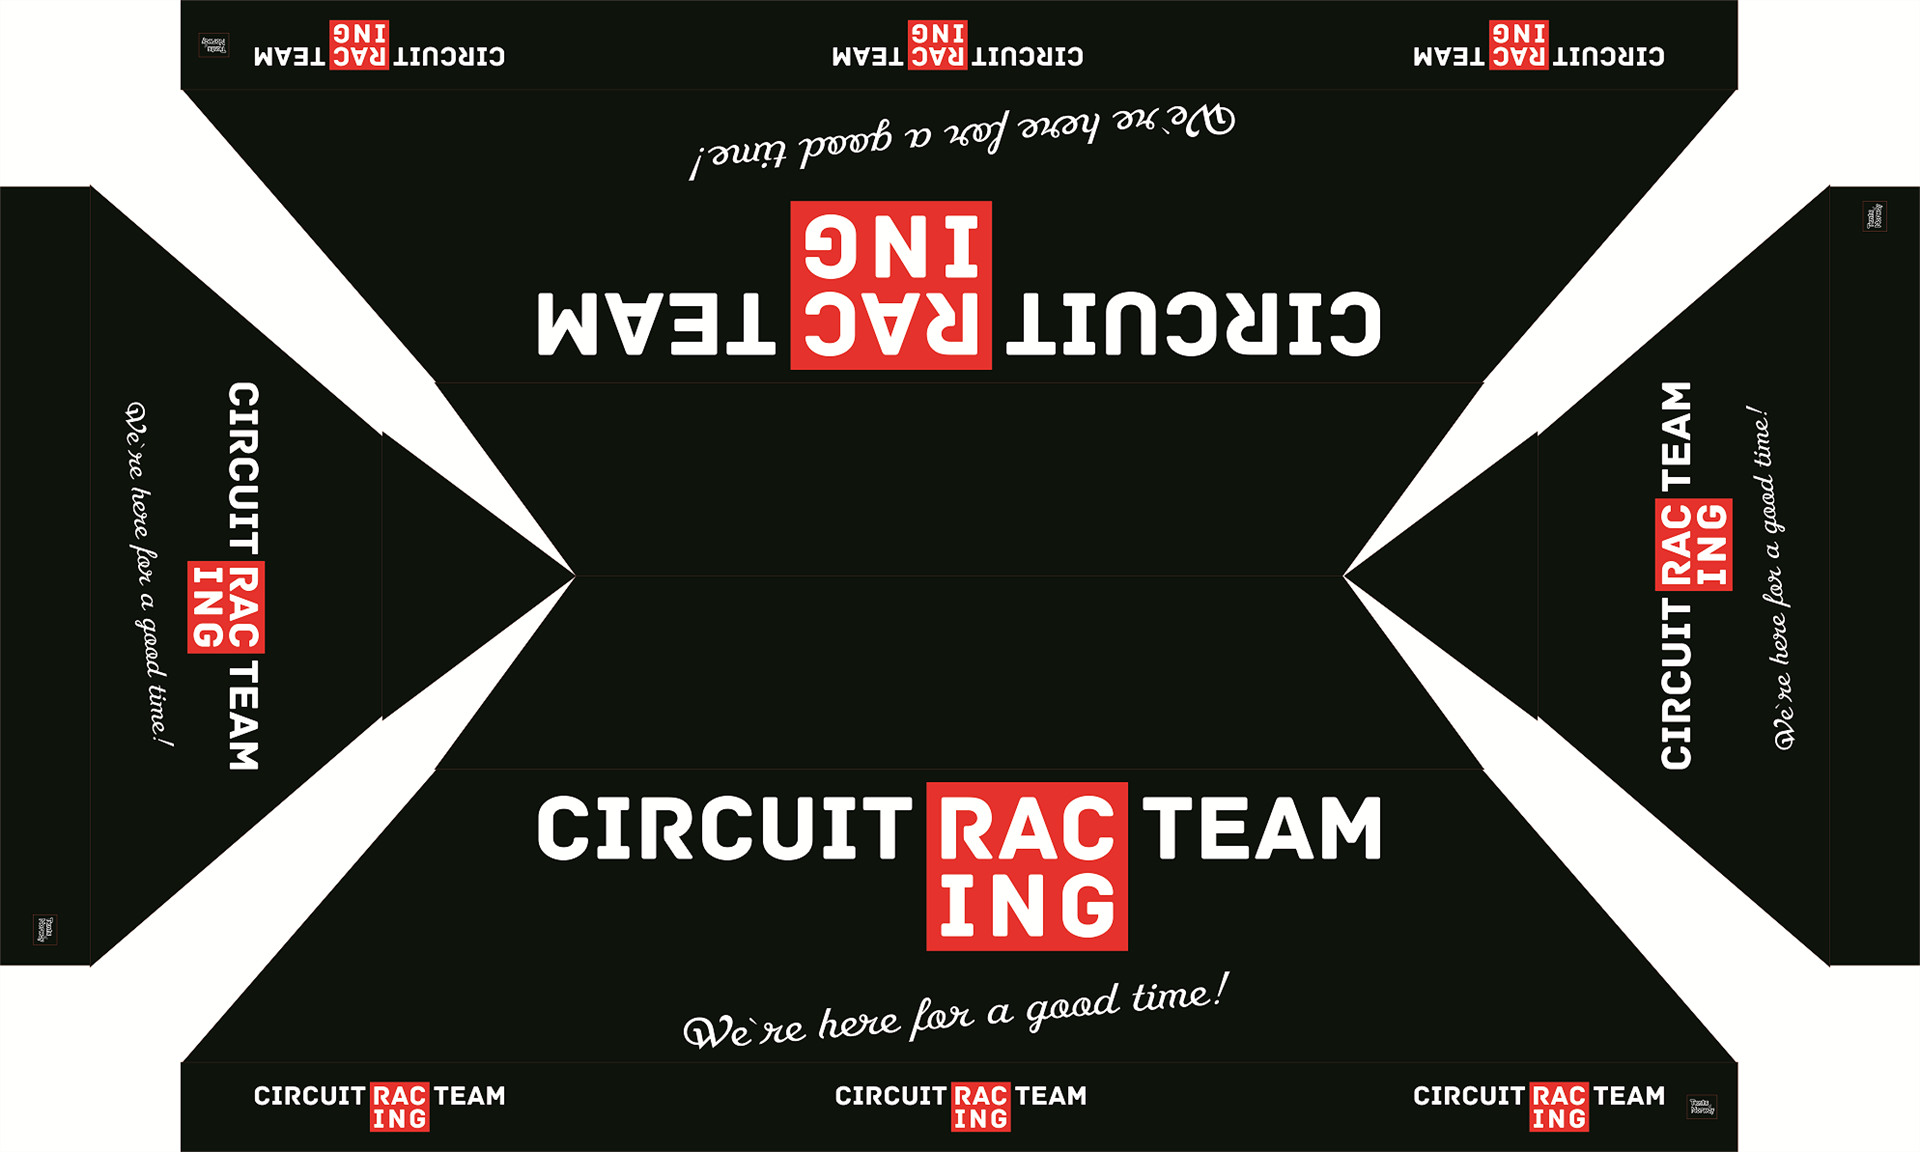 Circuit racing team